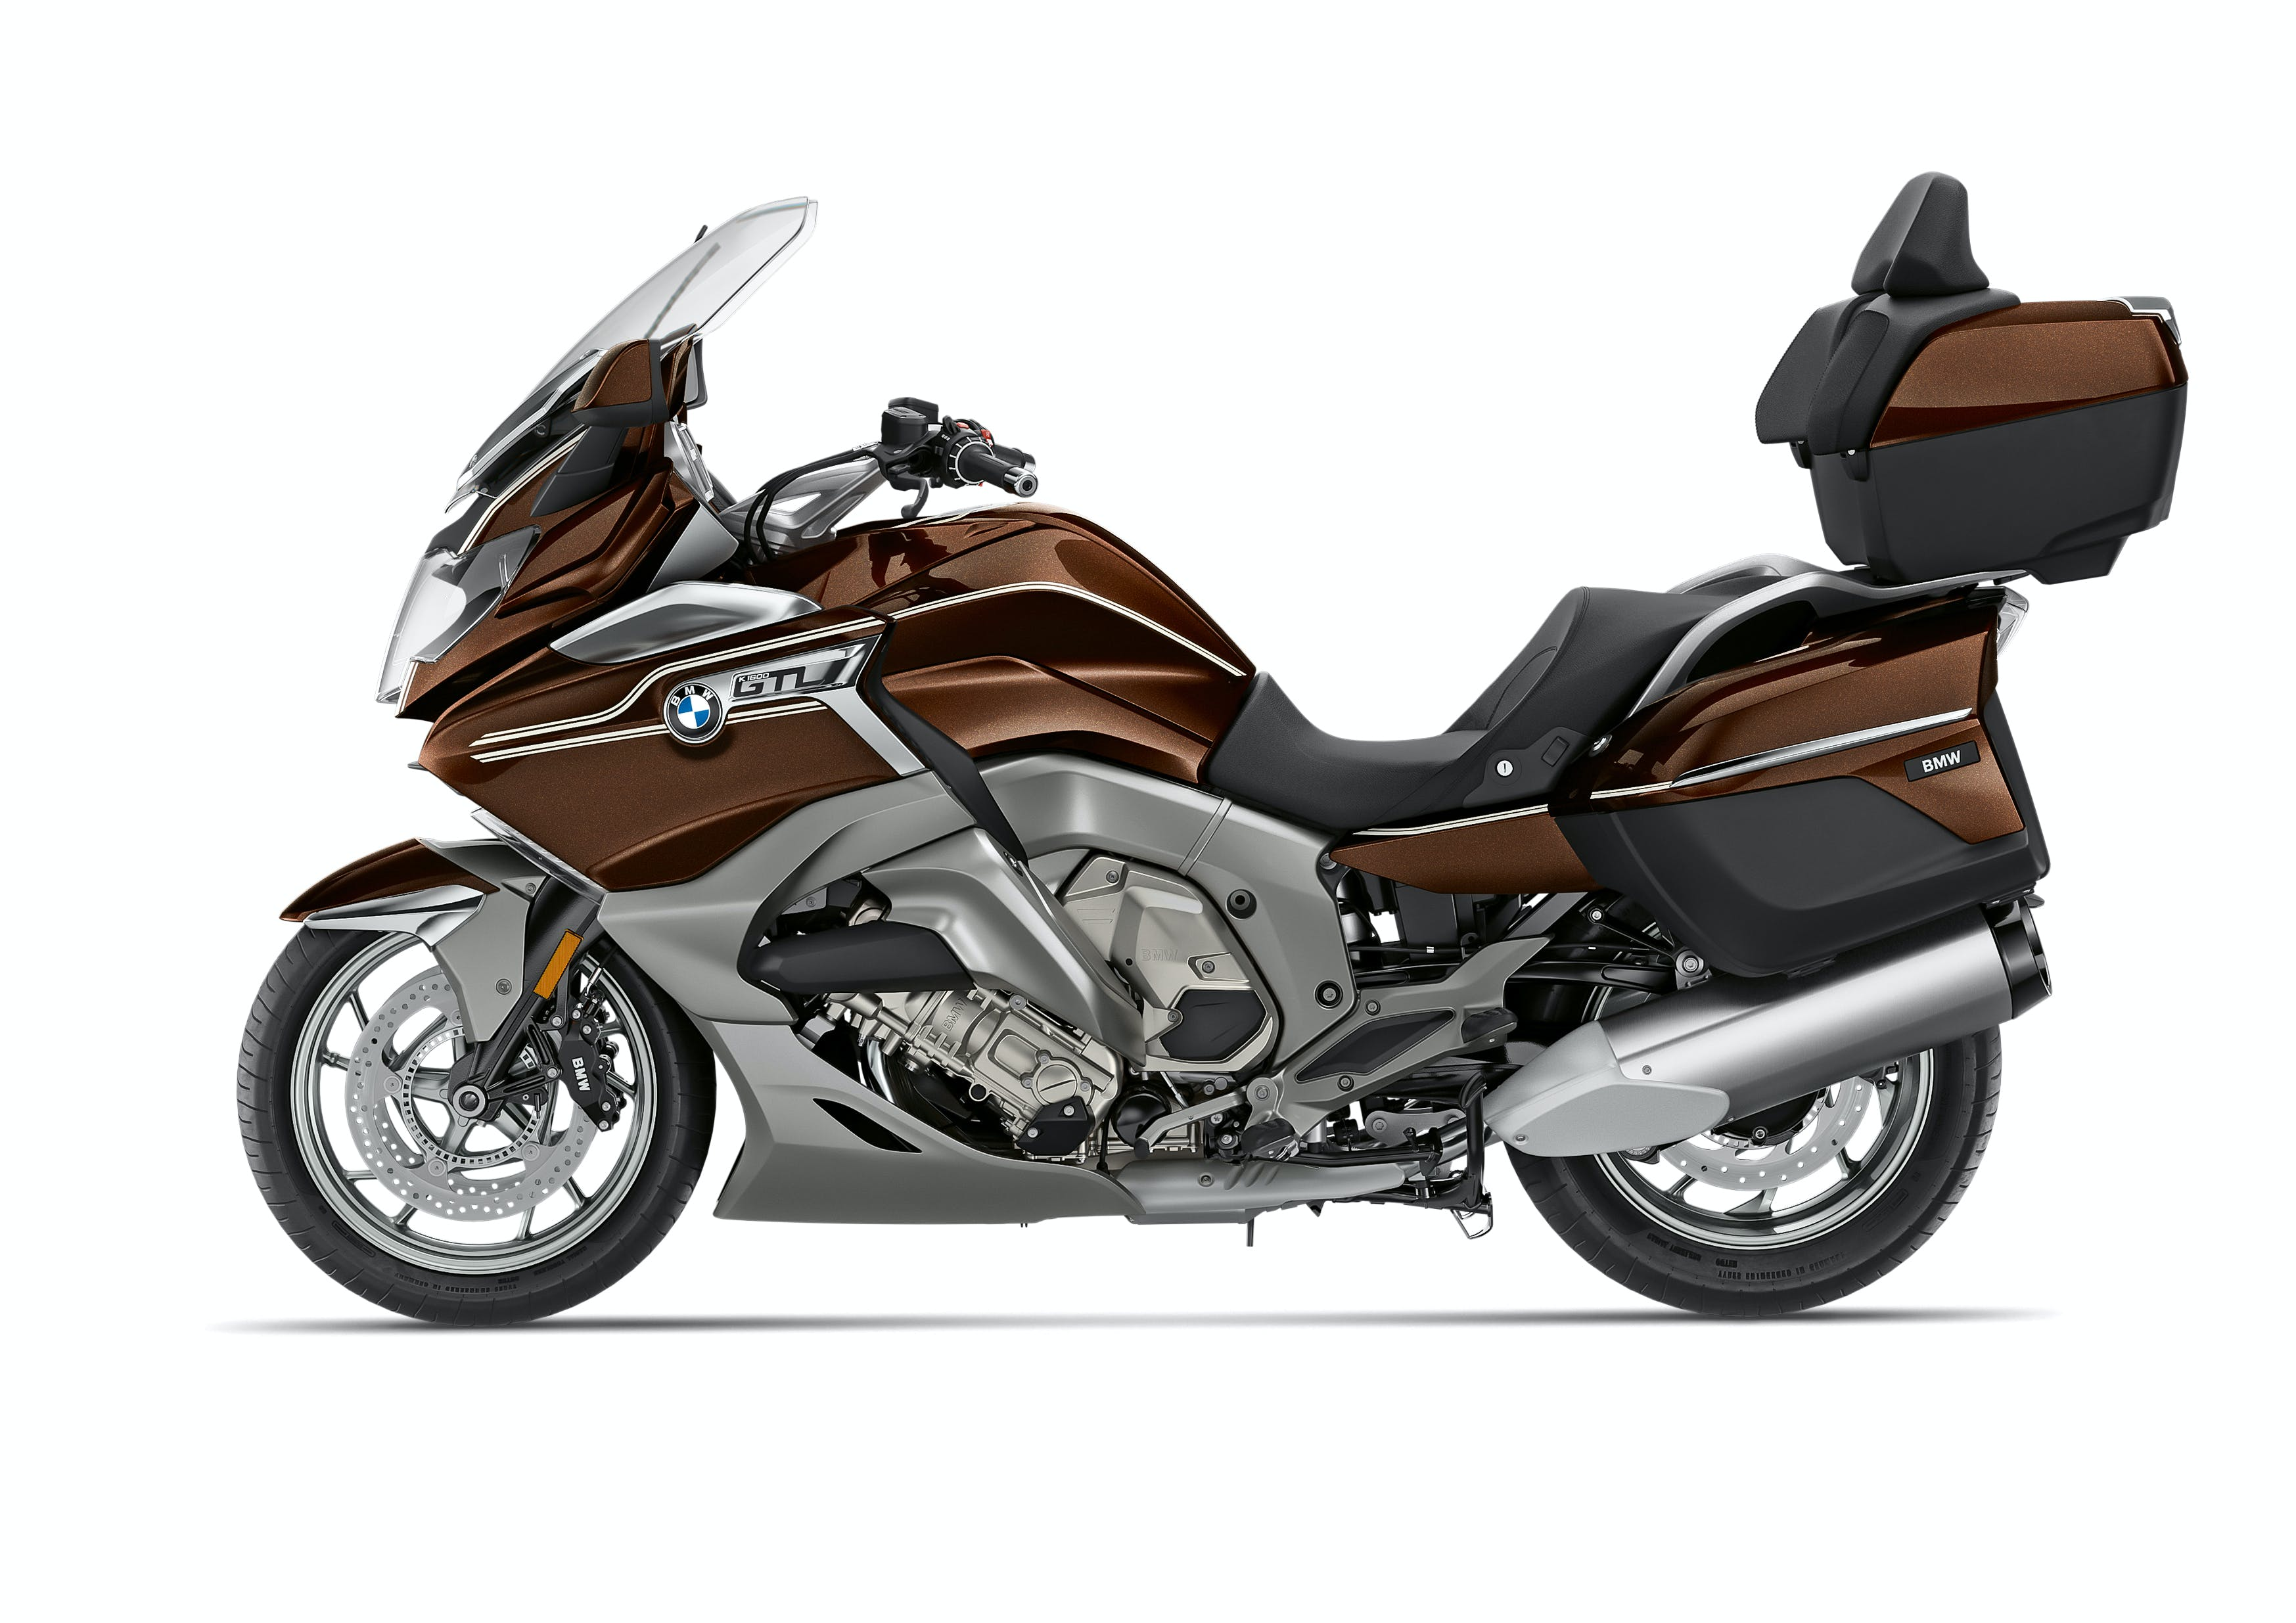 BMW K 1600 GTL (Option 719) in Stardust Metallic colour